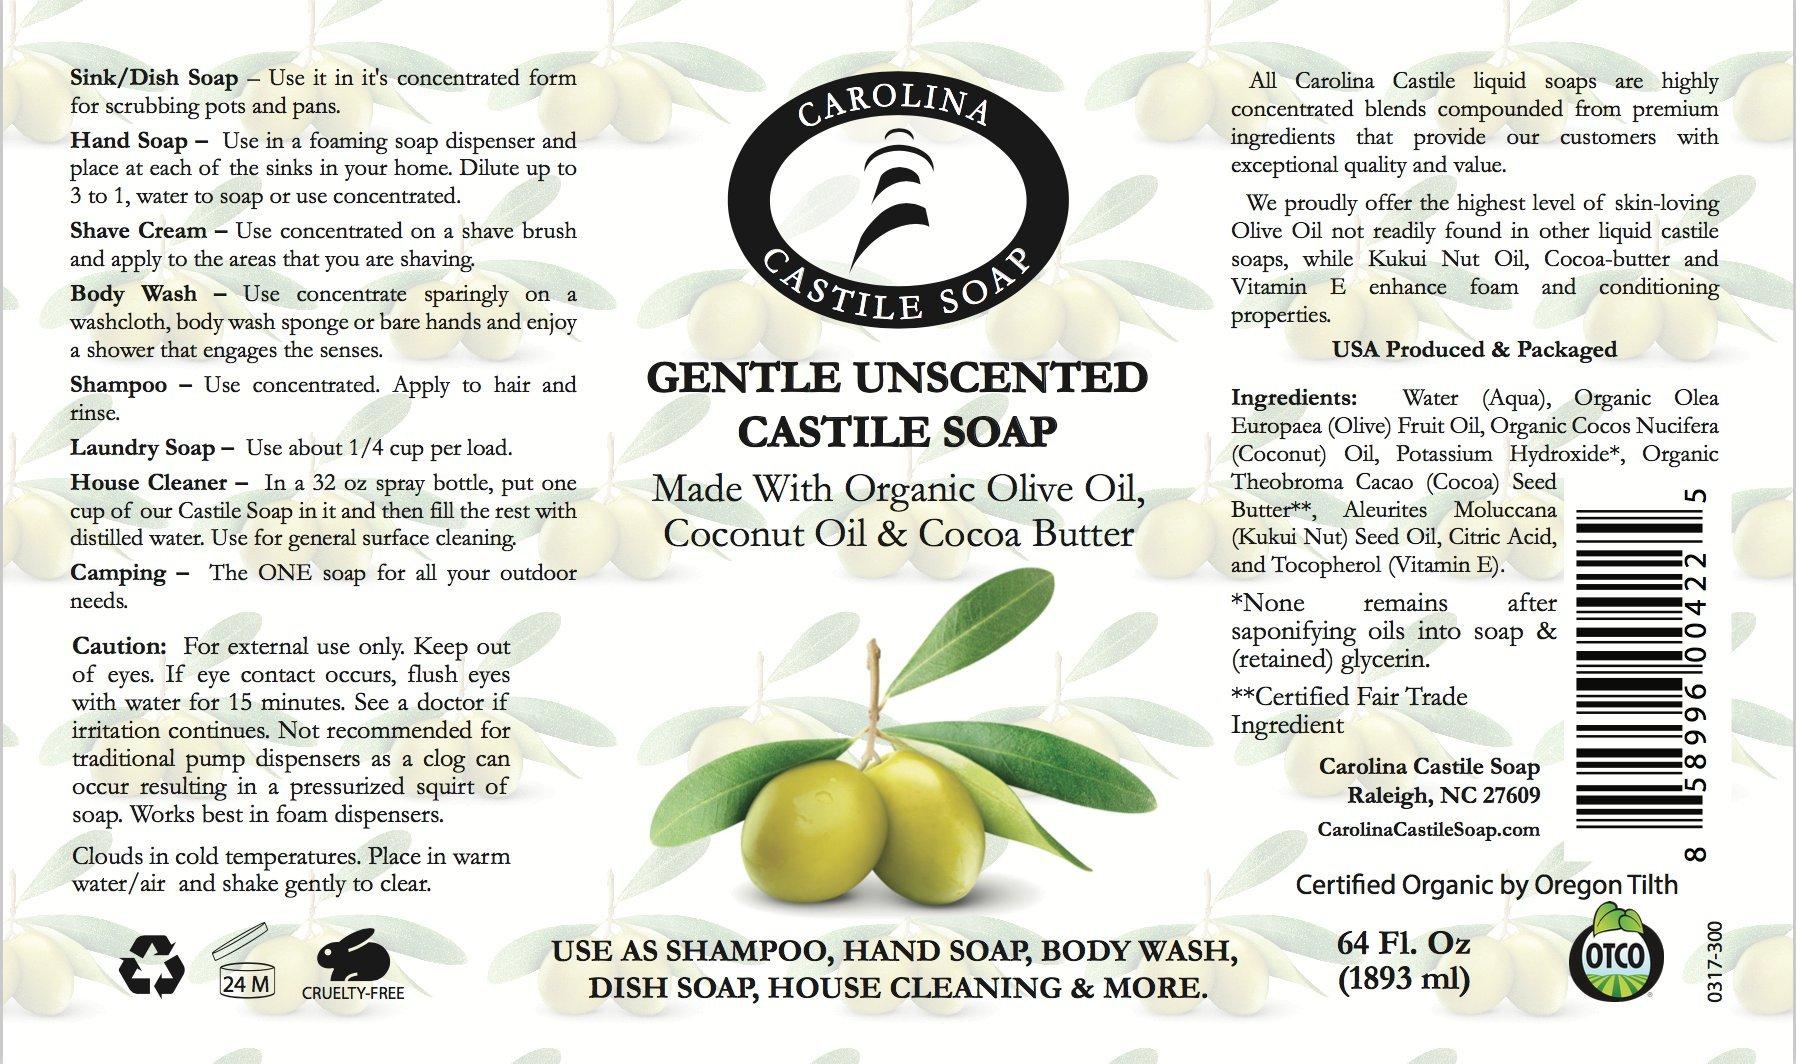 Carolina Castile Soap Gentle Unscented | Certified Organic - 64 Oz by Carolina Castile Soap (Image #2)